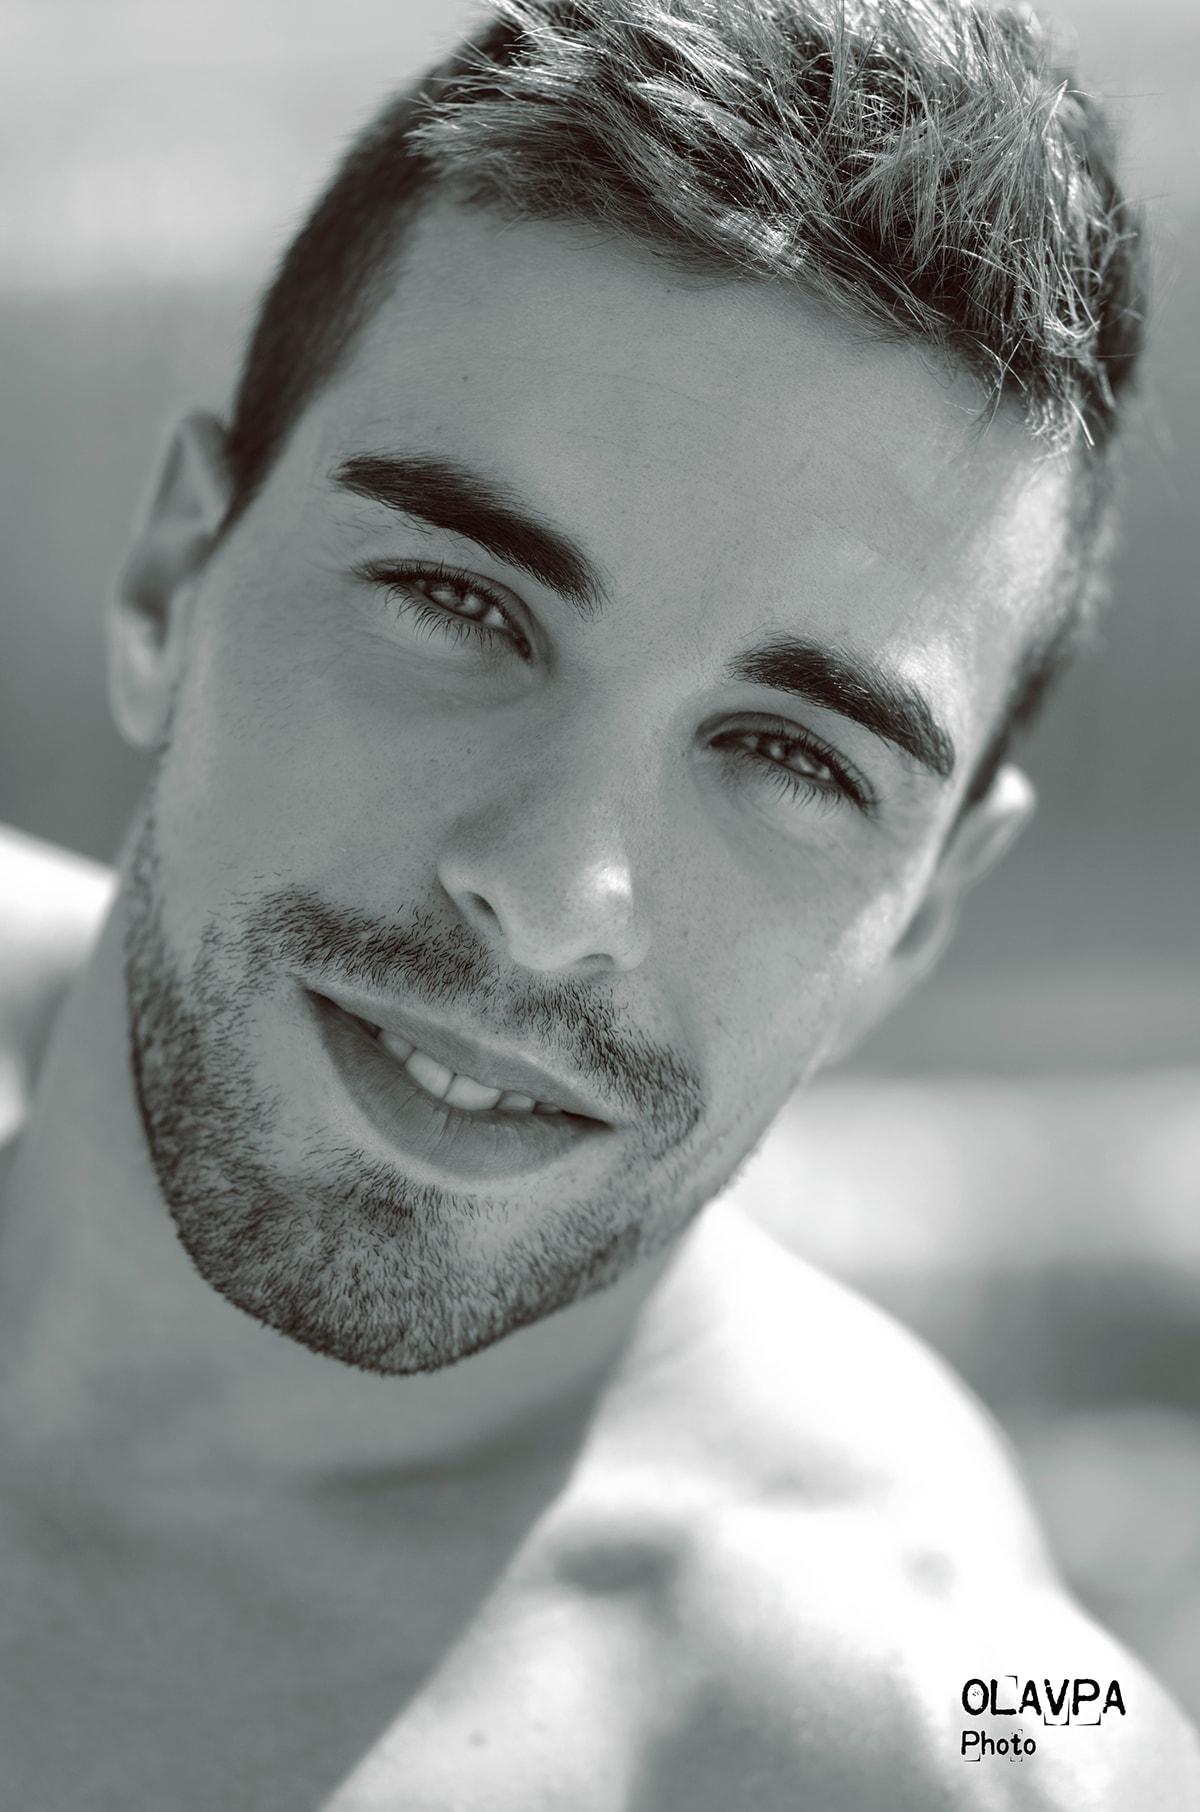 Josh from Barcelona